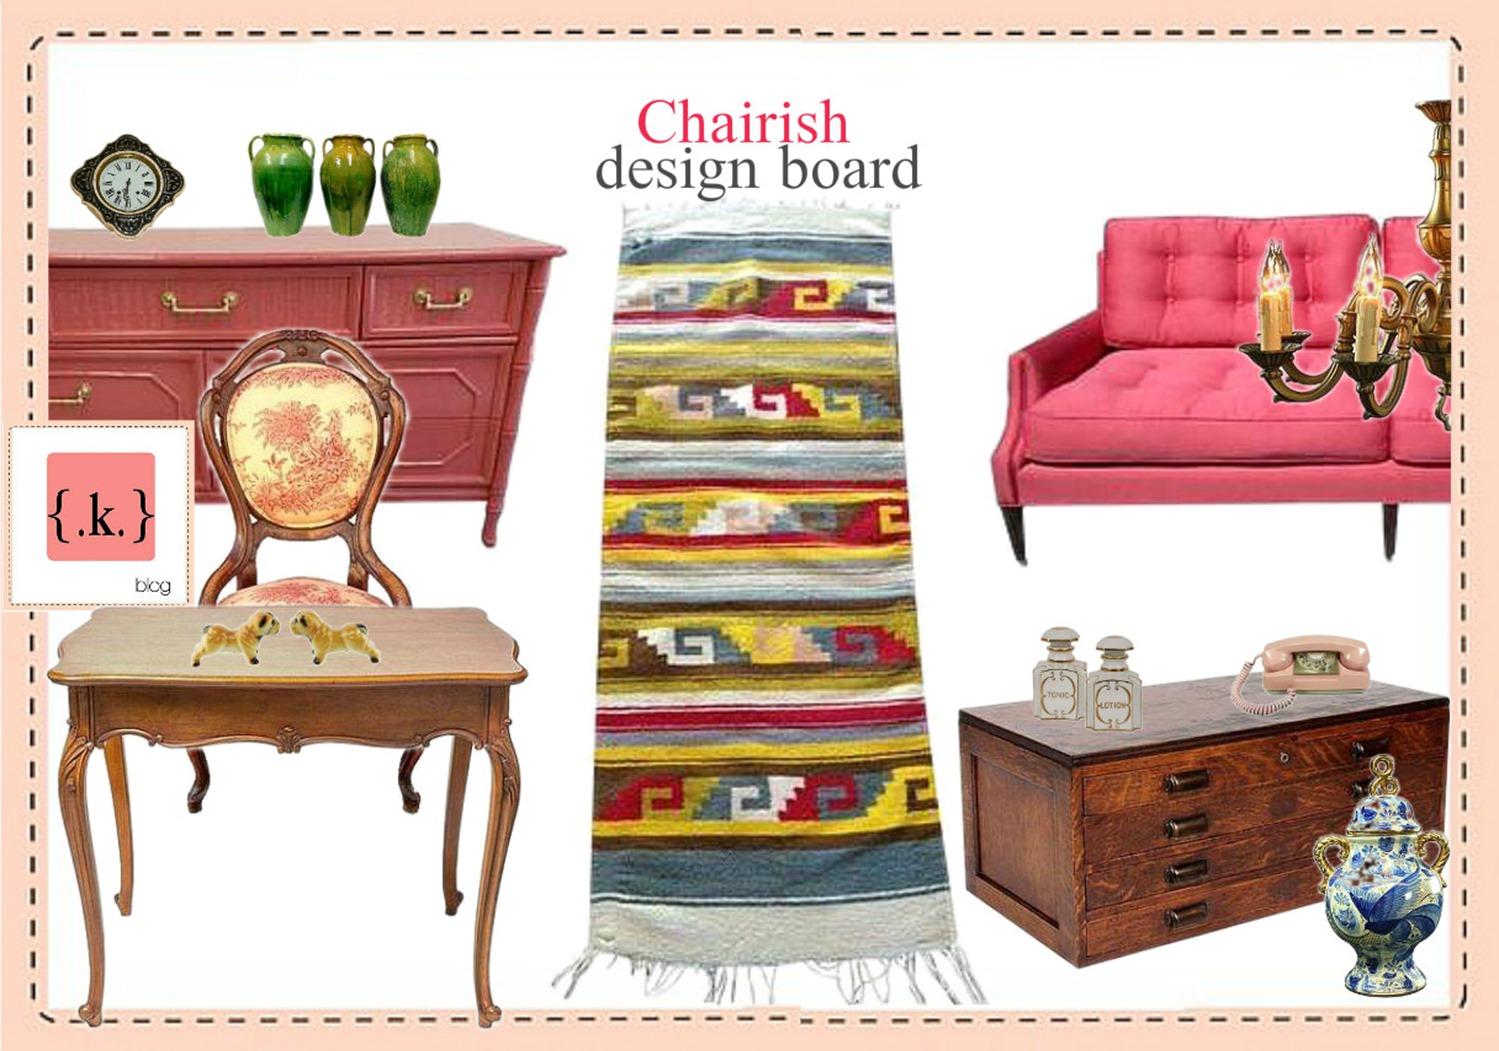 design board by konstadina nastou, interior designer, https://kinteriorsblog.wordpress.com/